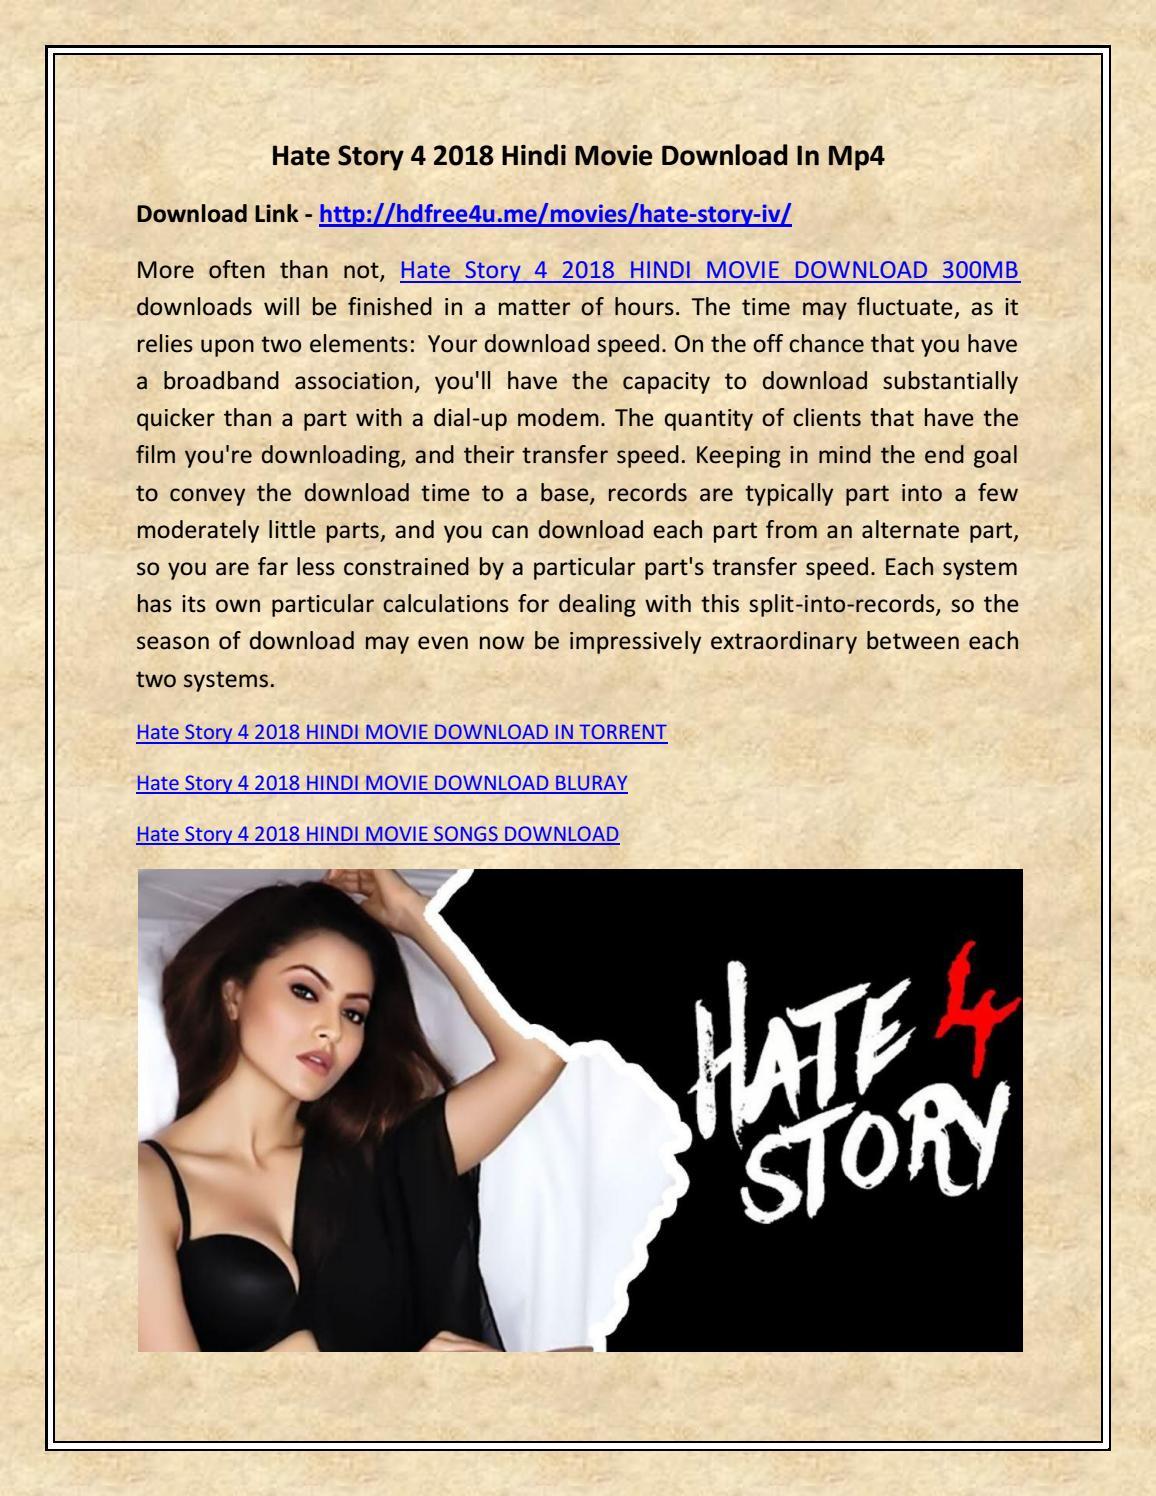 hate story 4 2018 hindi movie download in mp4hdfree4u - issuu